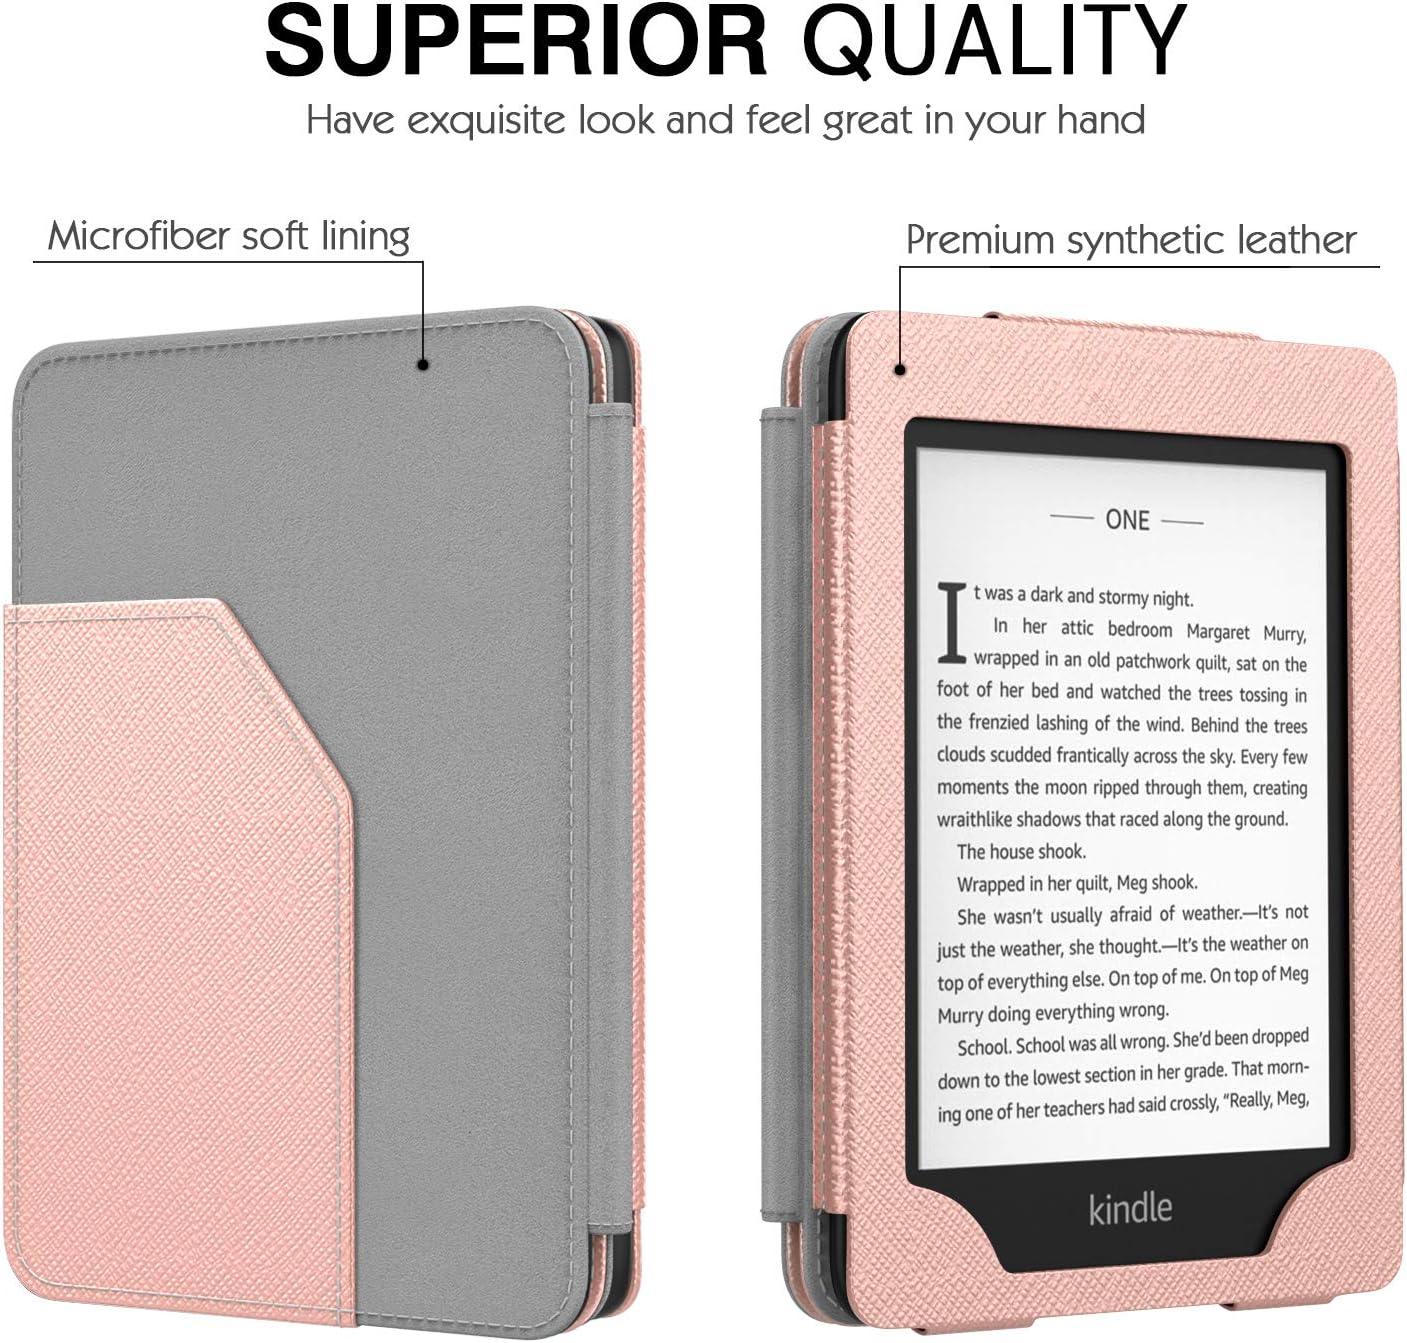 Superior Funda con Auto Sue/ño//Estela para  Kindle Paperwhite E-Reader - Gris 10th Generation, 2018 Release MoKo Funda para Kindle Paperwhite